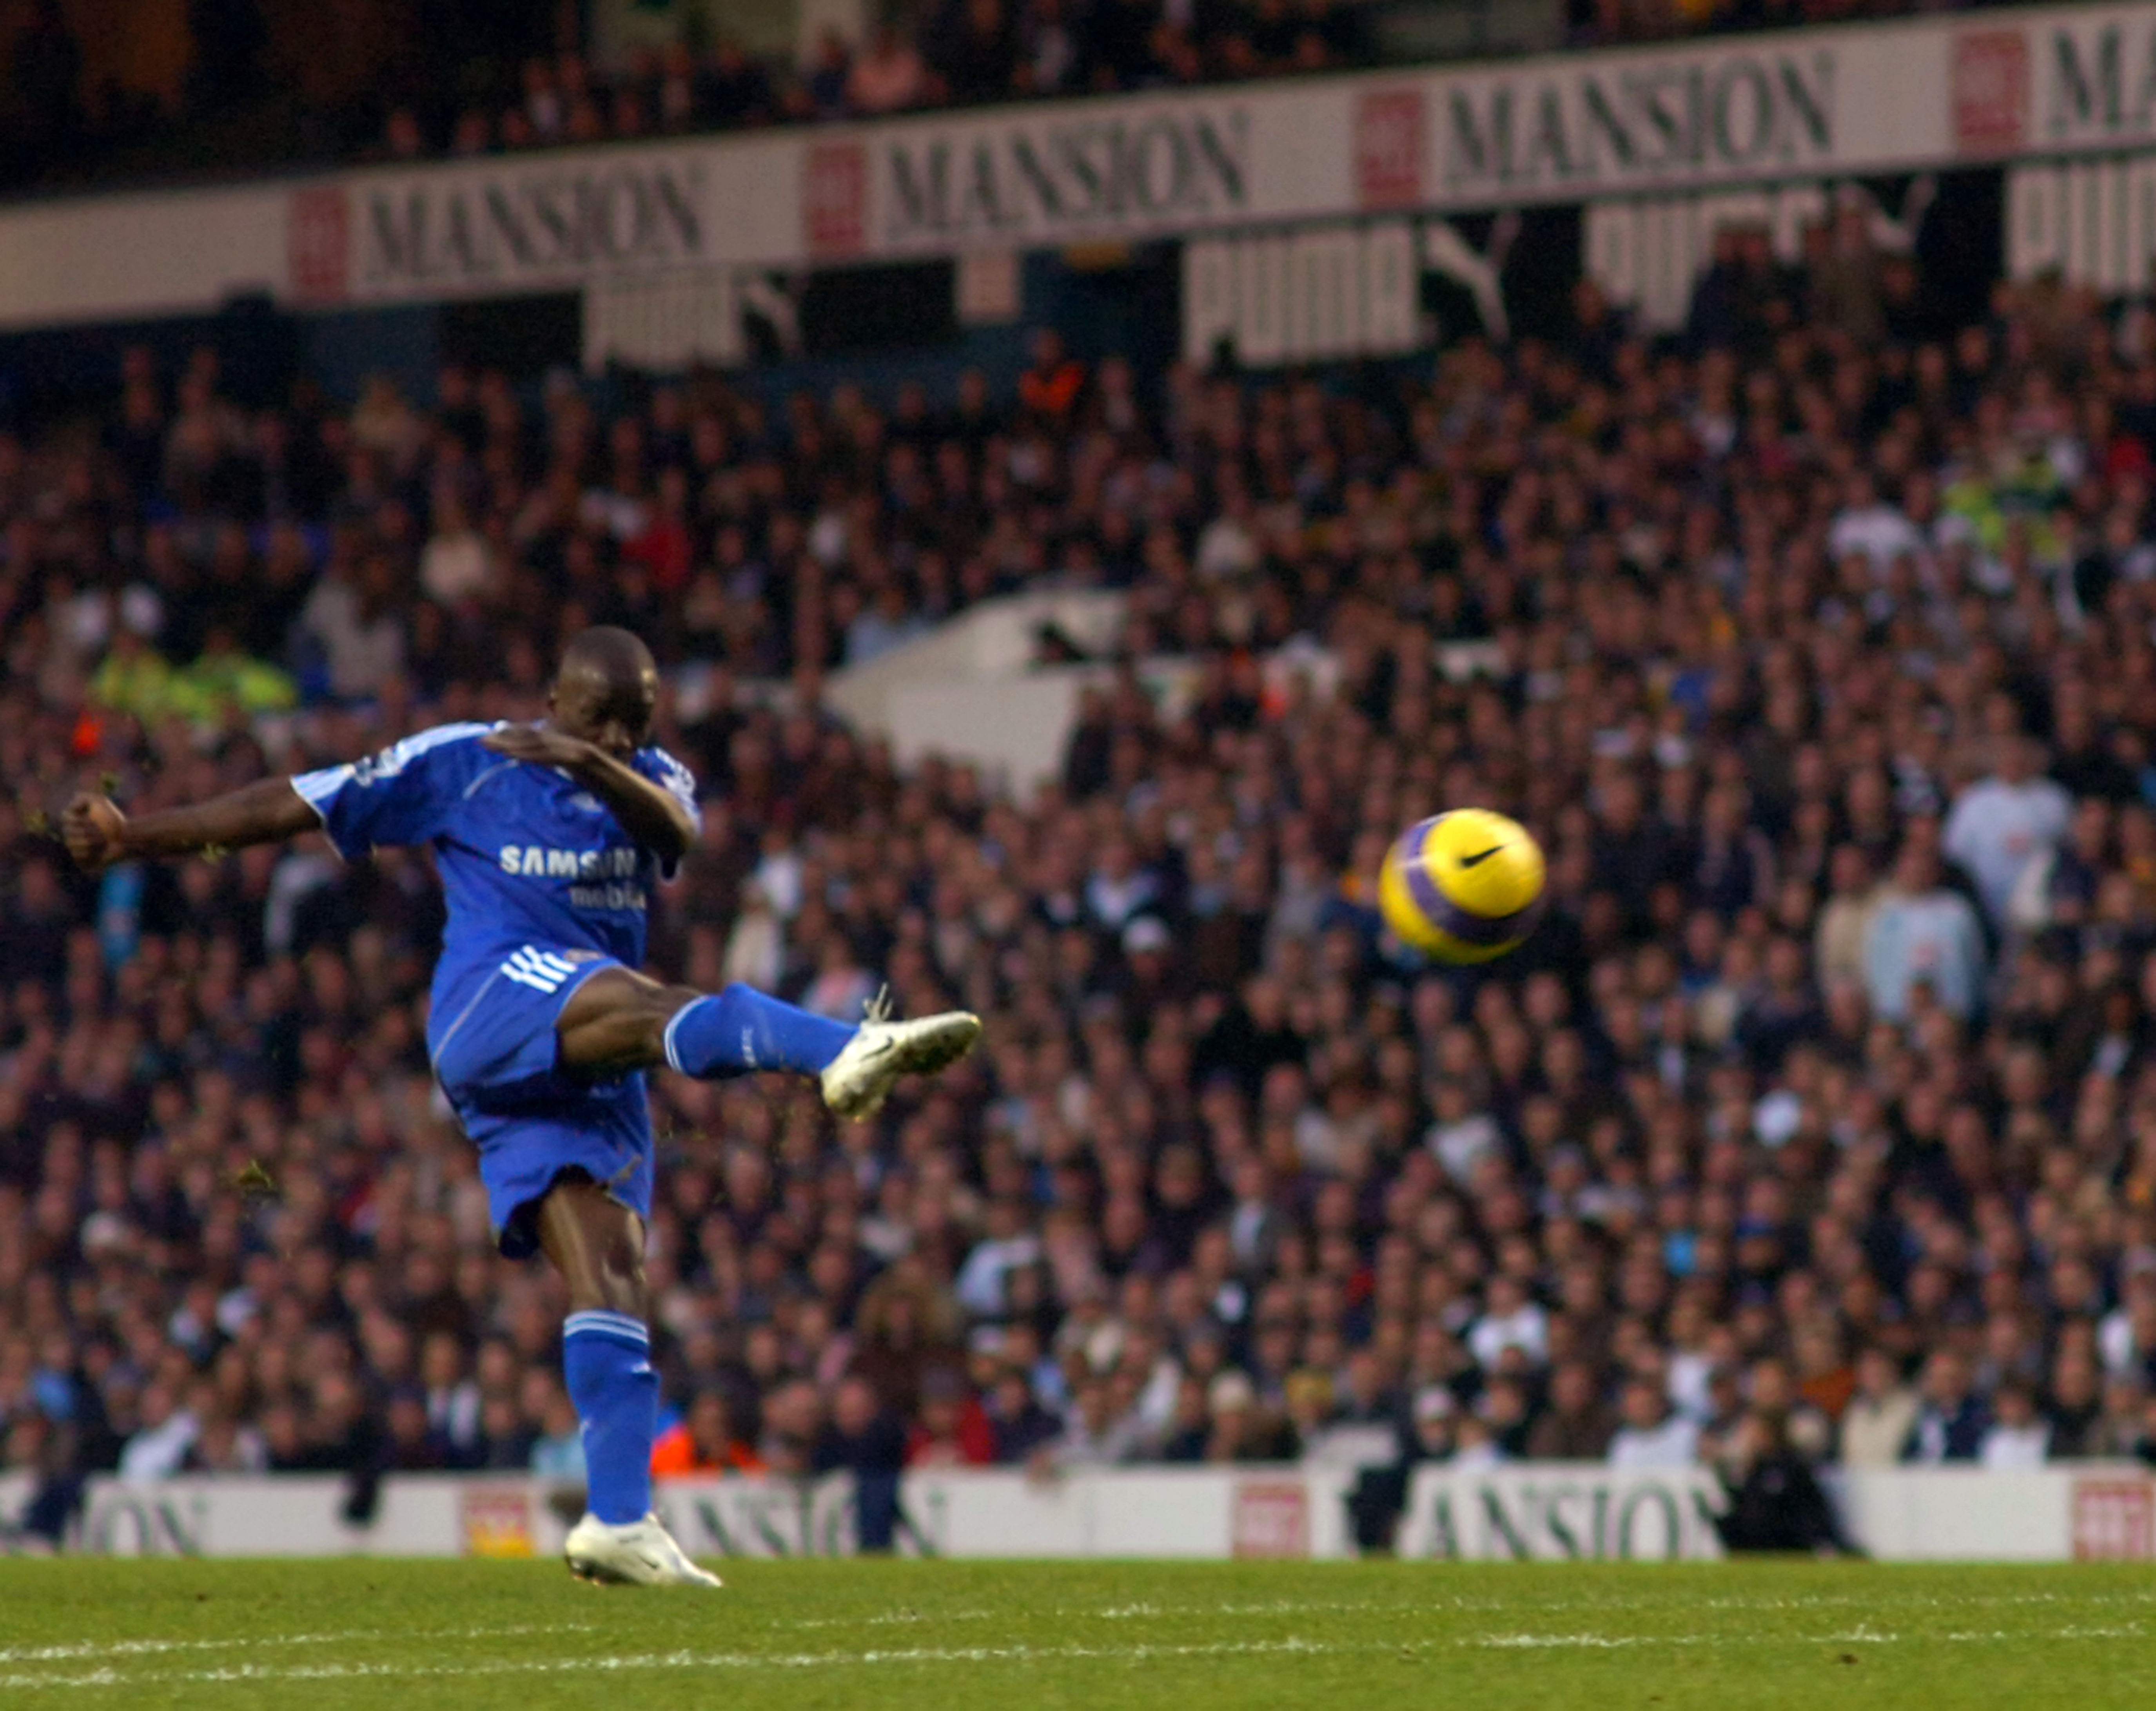 Soccer - FA Barclays Premiership - Tottenham Hotspur v Chelsea - White Hart Lane